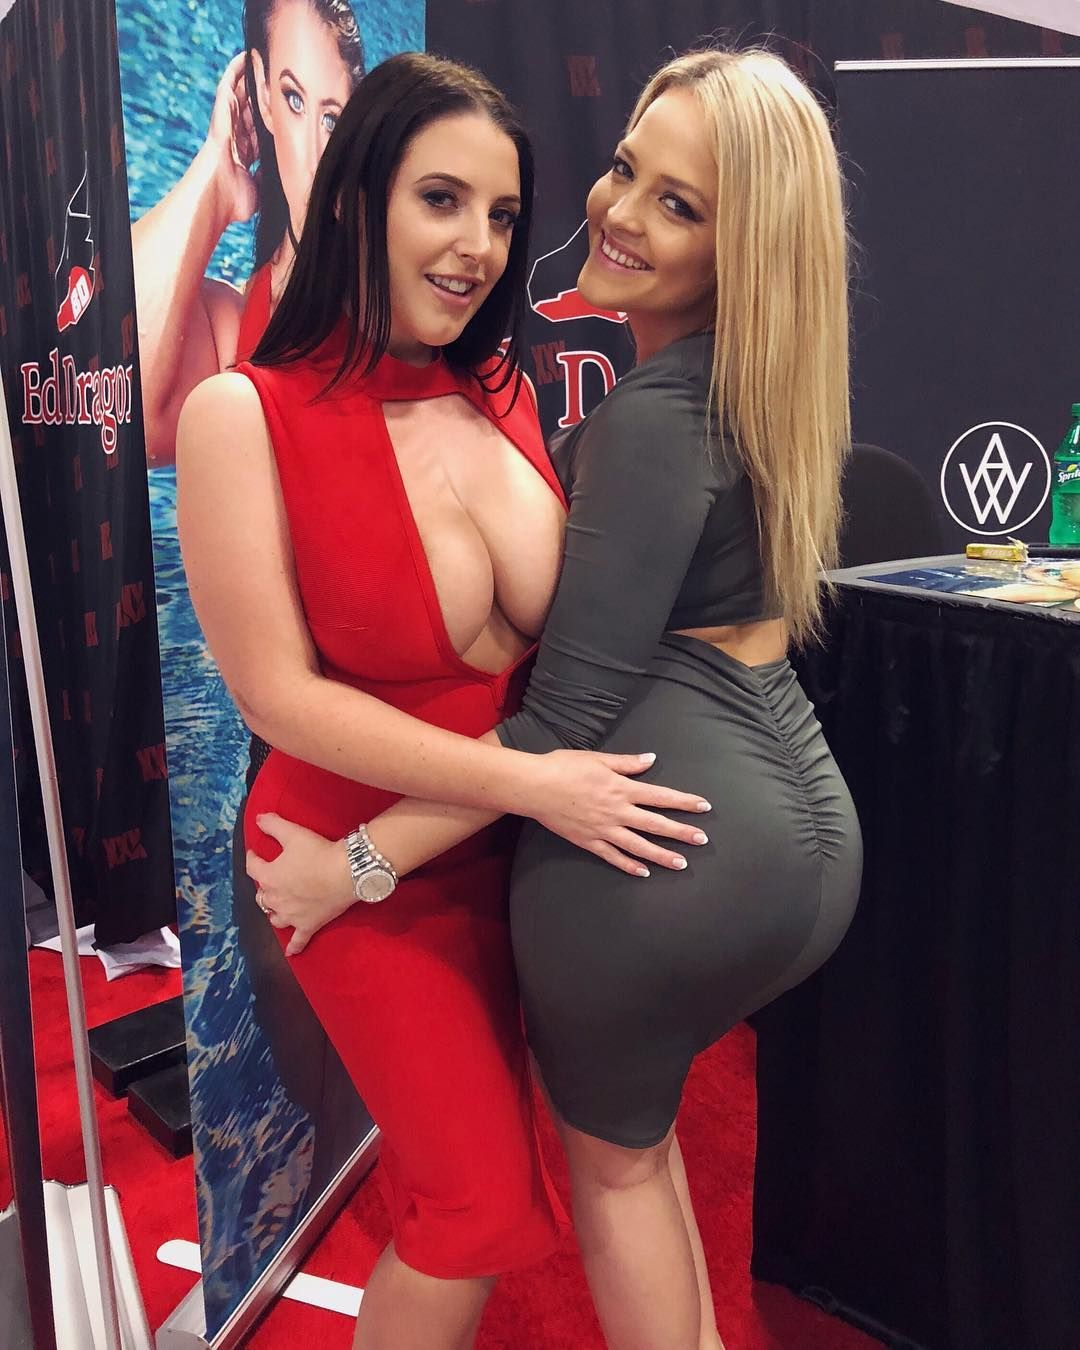 Angela Serna Porno 73 9k likes 1 019 comments angela white theangelawhite on